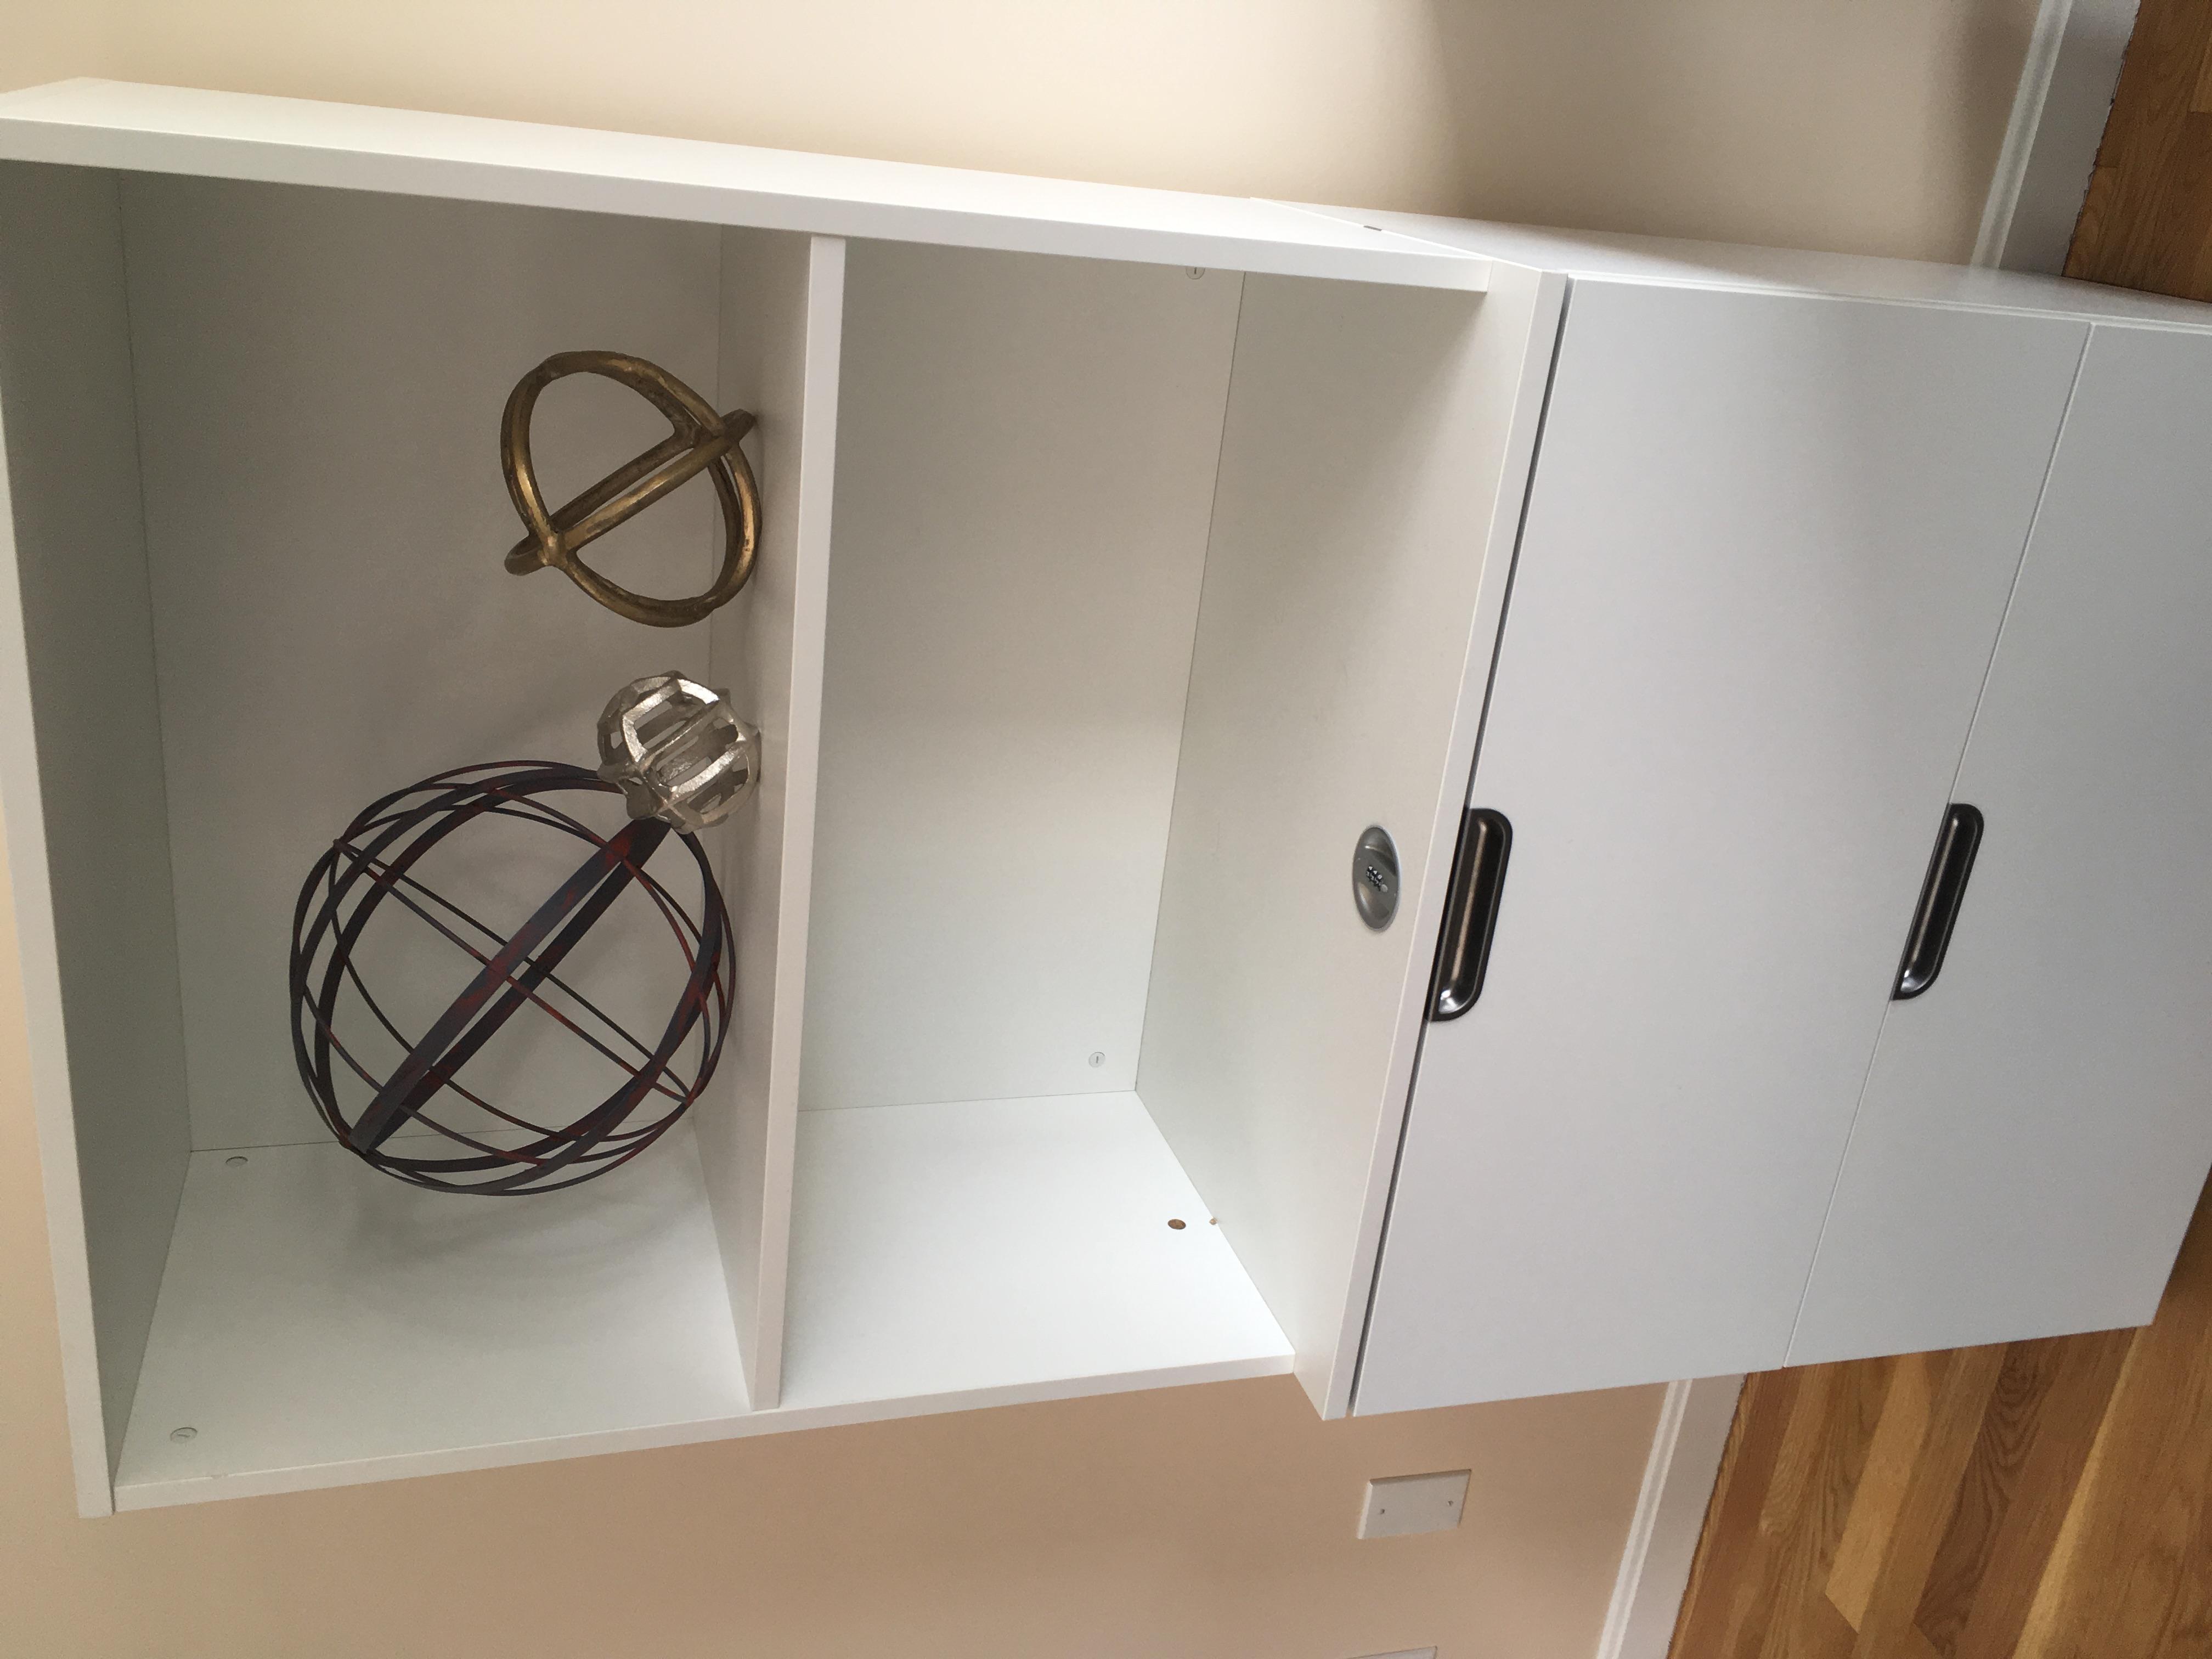 Locking storage available